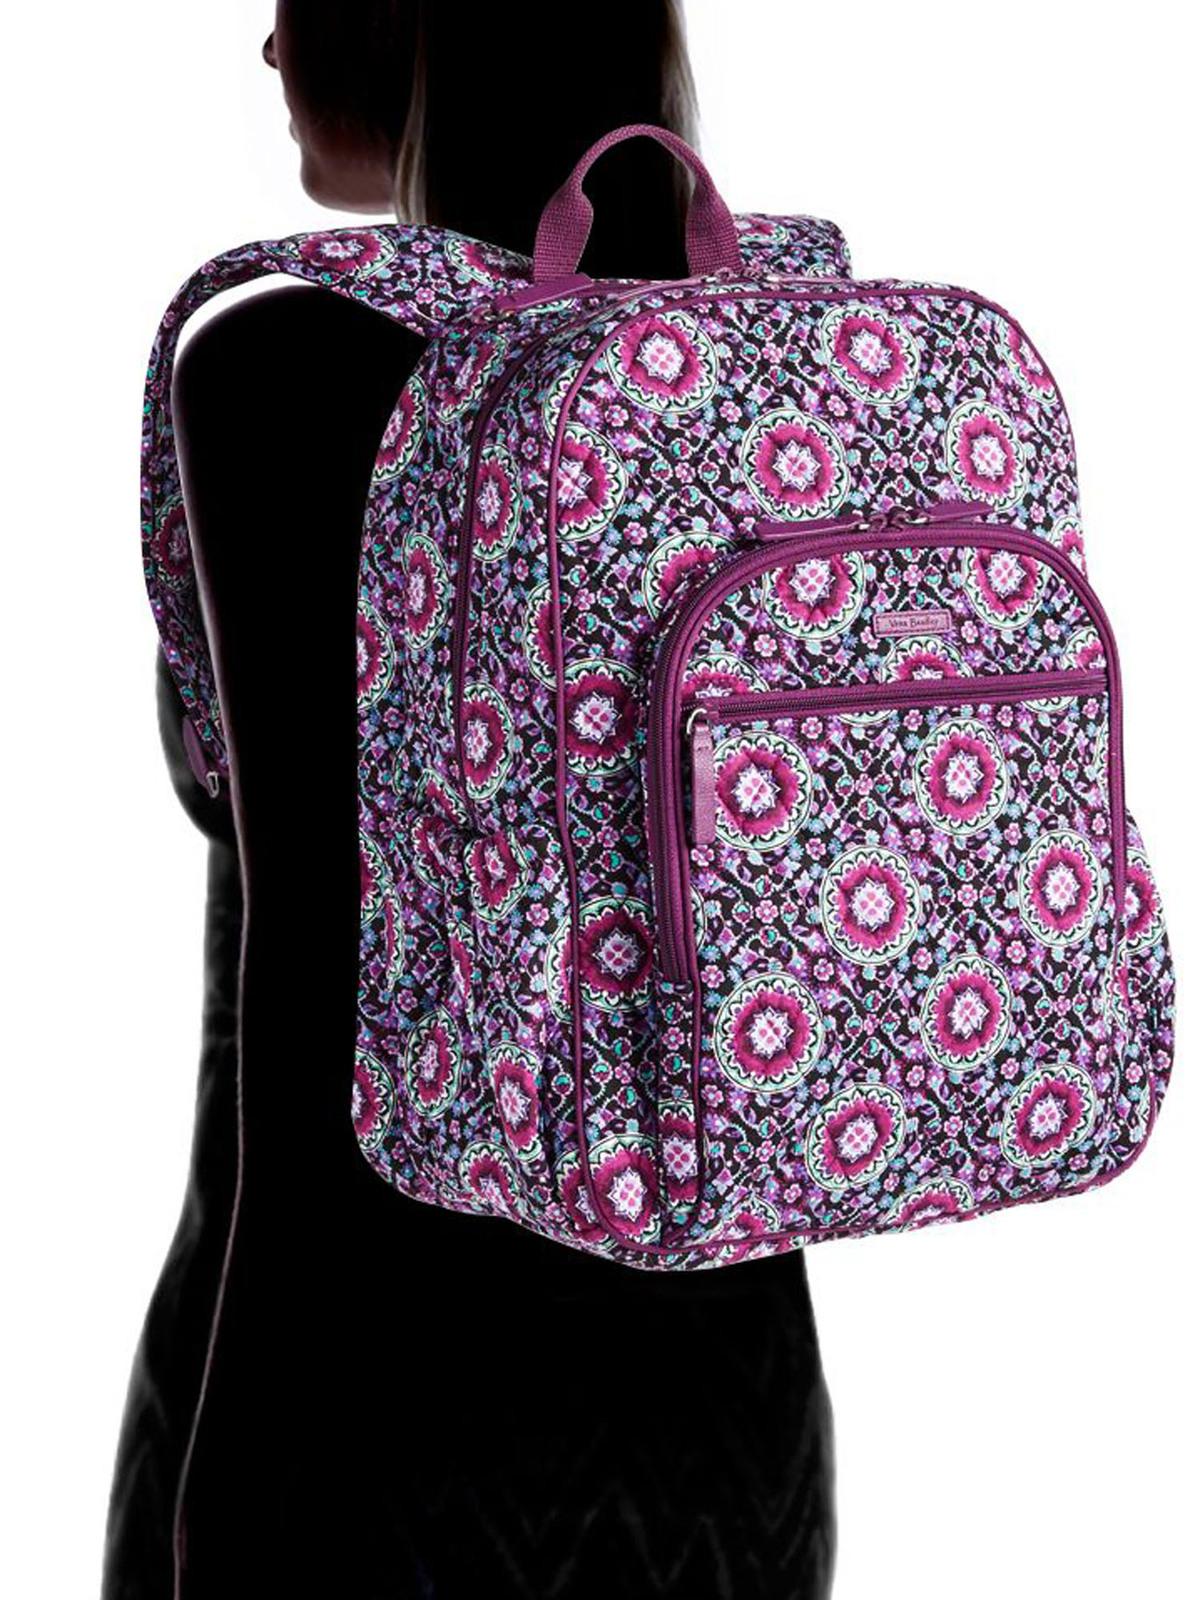 Vera Bradley Signature Cotton Campus Tech Backpack, Lilac Medallion image 2